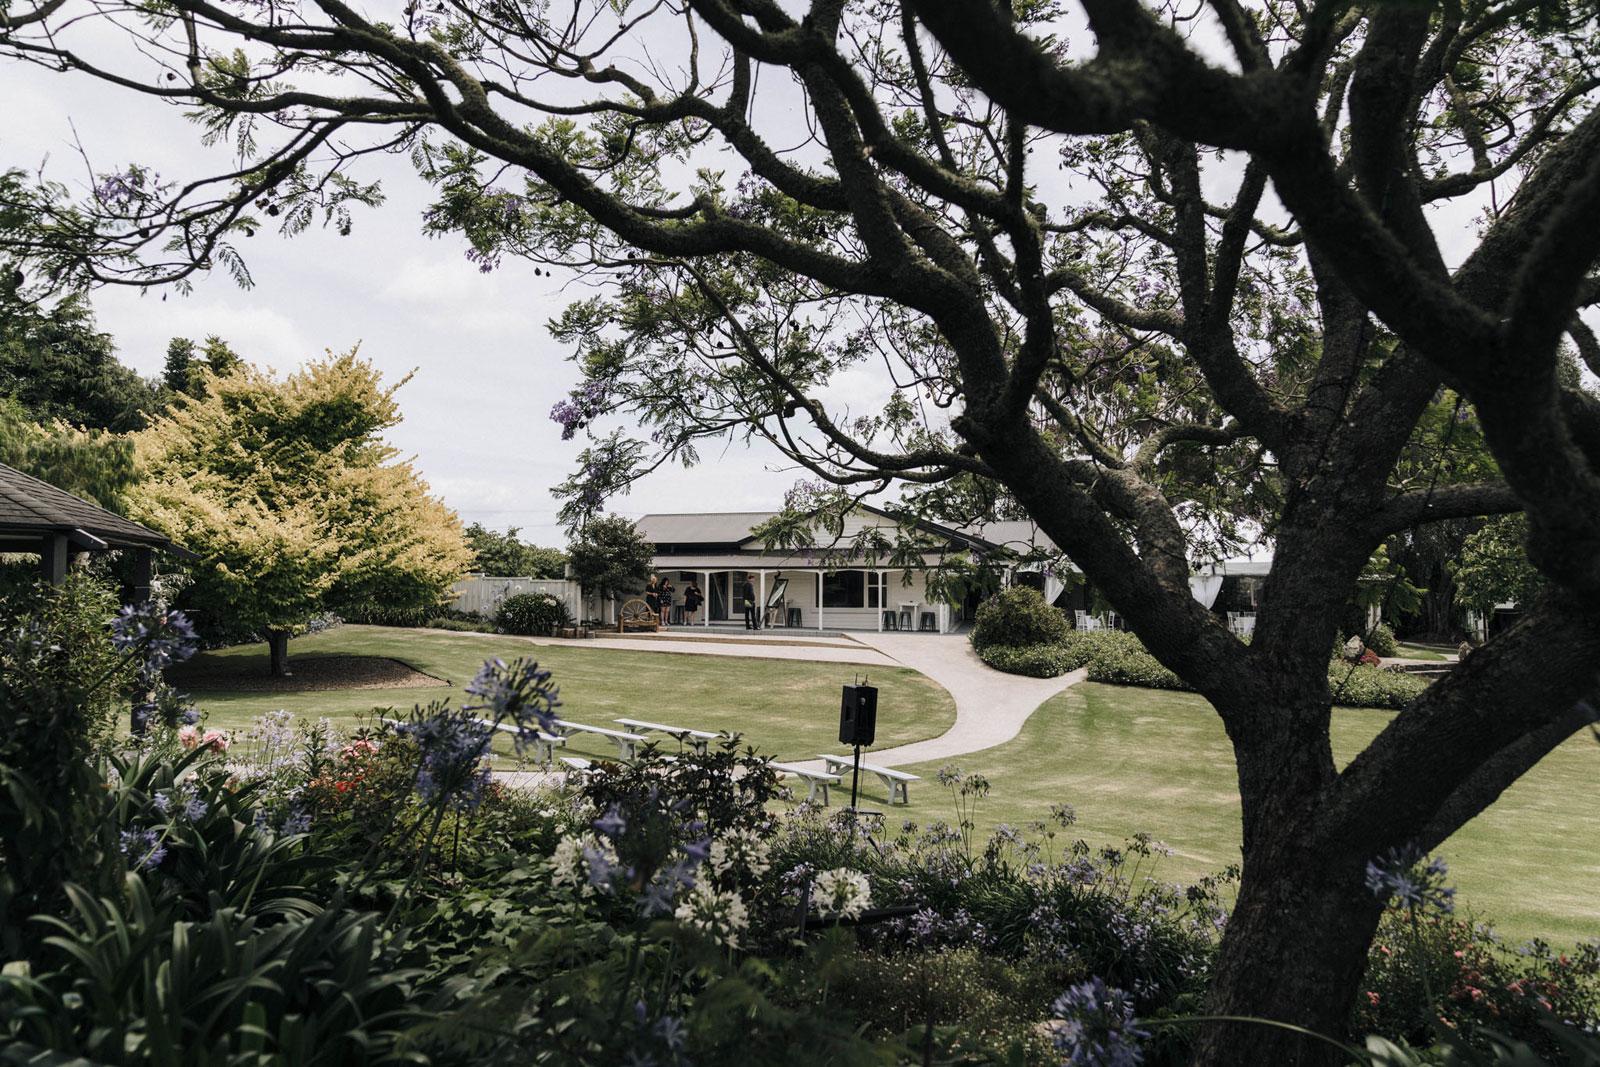 newfound-n-c-olive-tree-cottage-tauranga-wedding-photographer-311